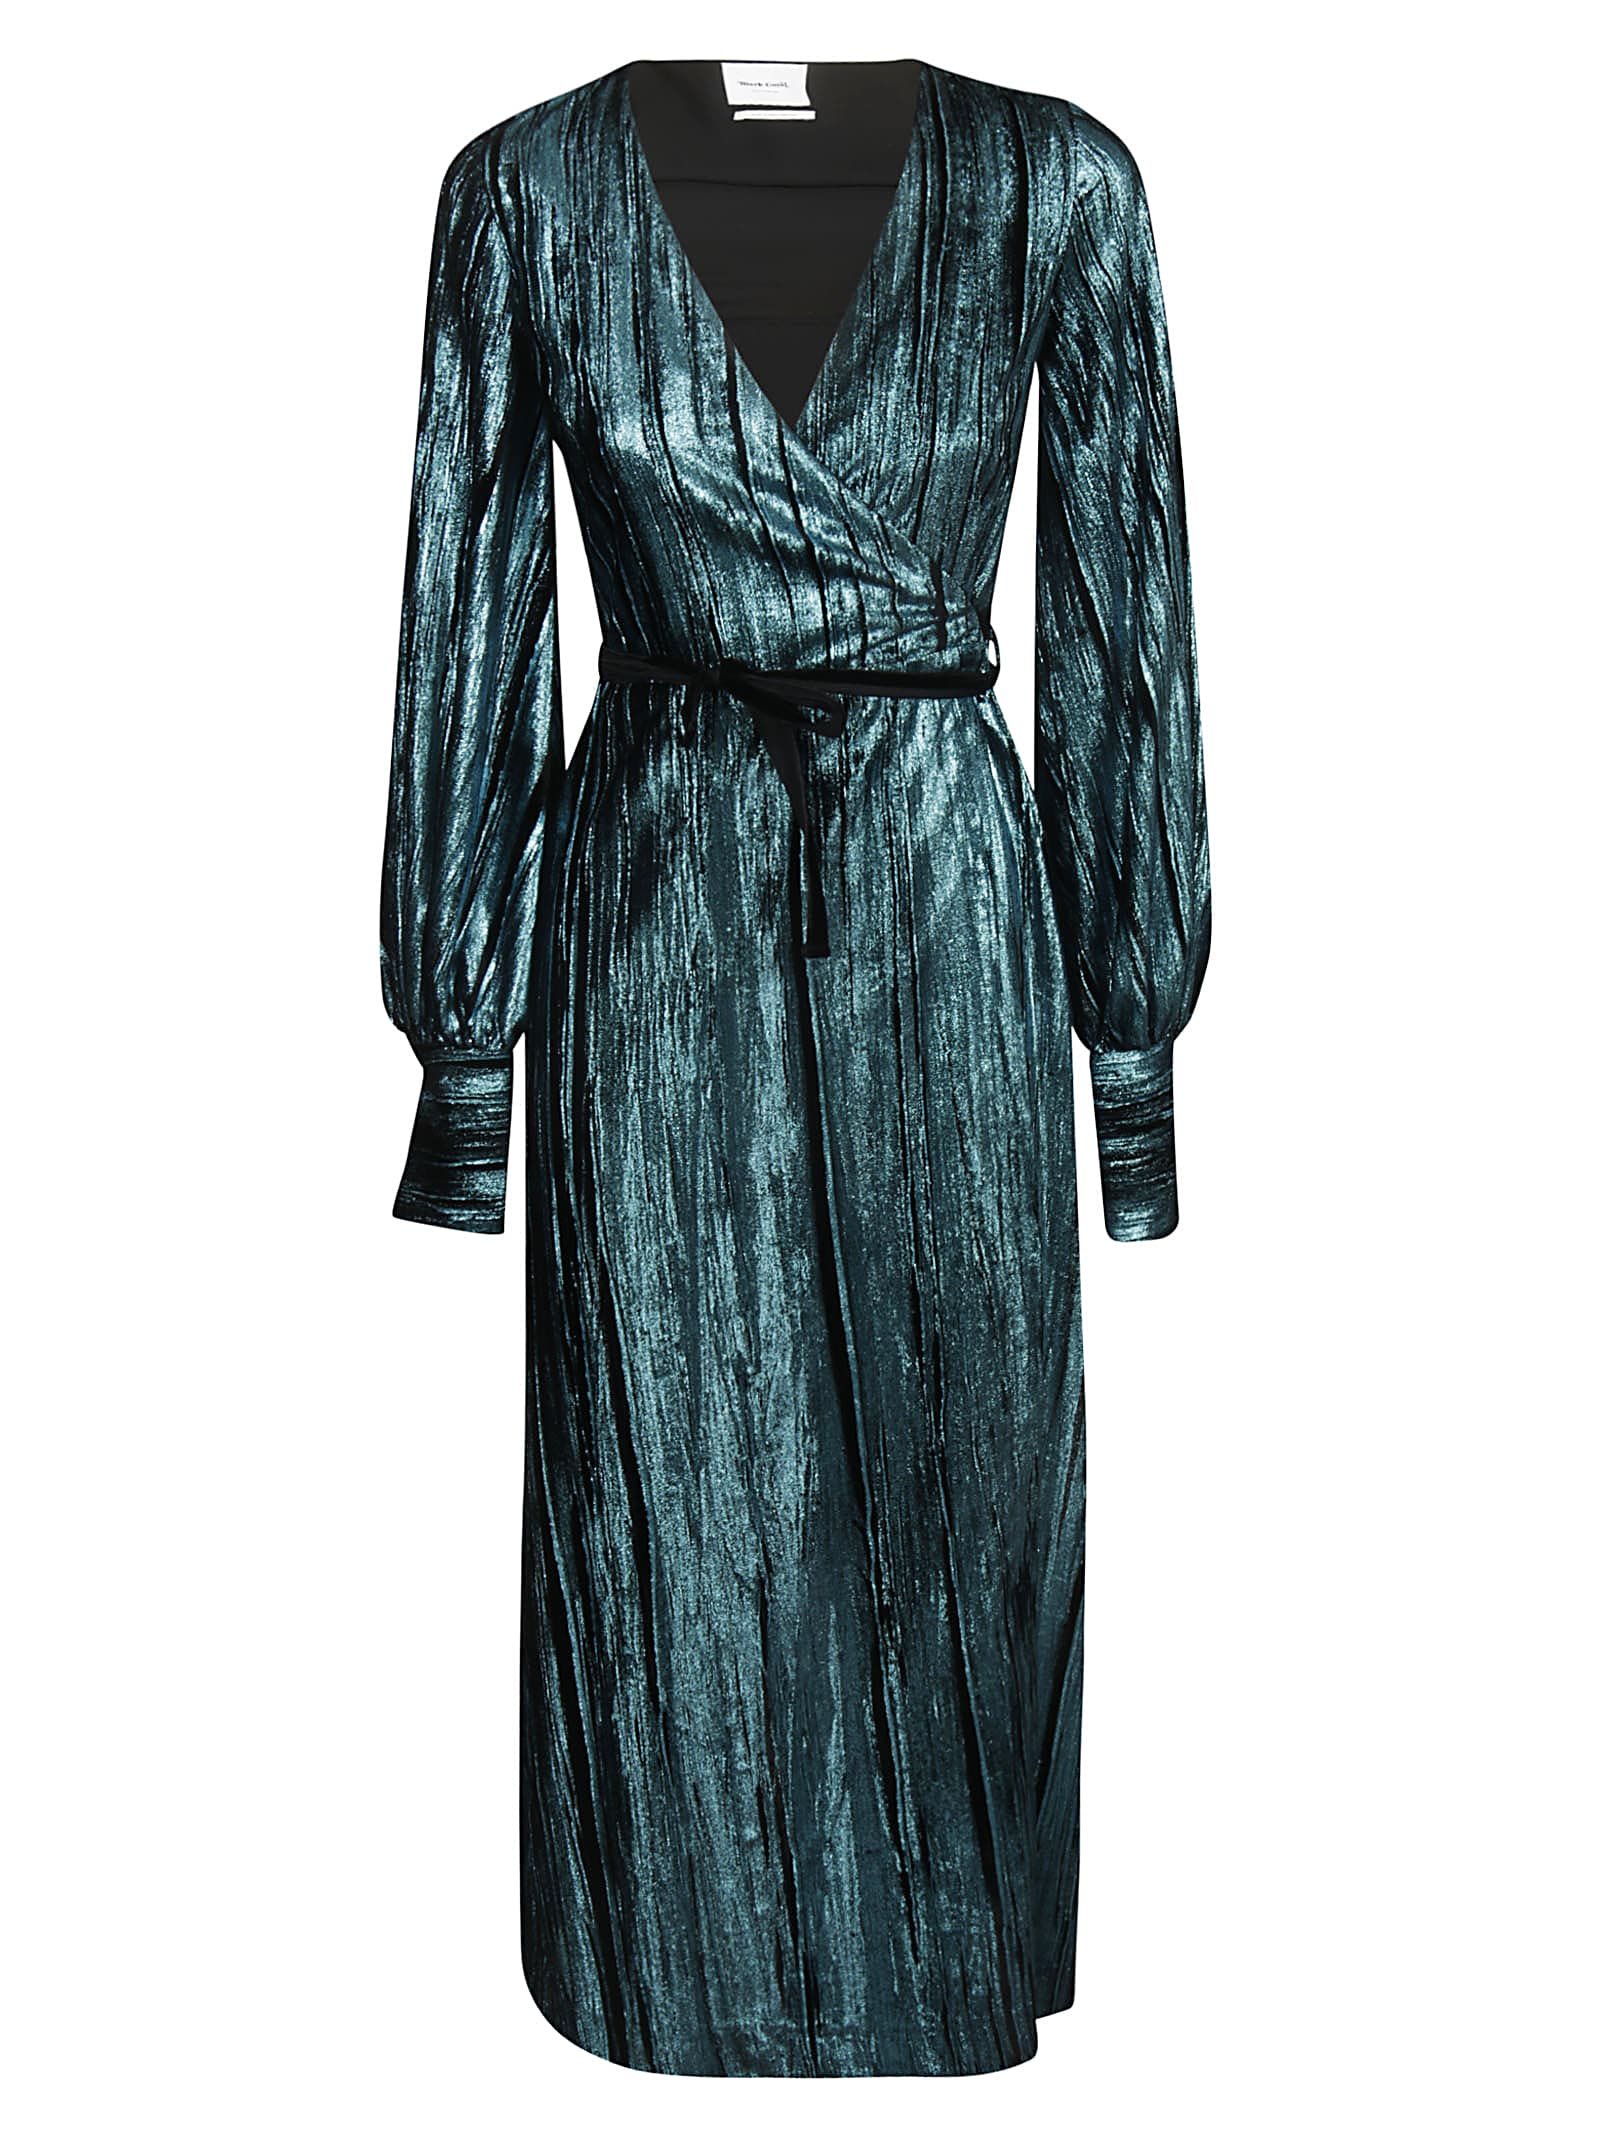 Black Coral Ava Dress